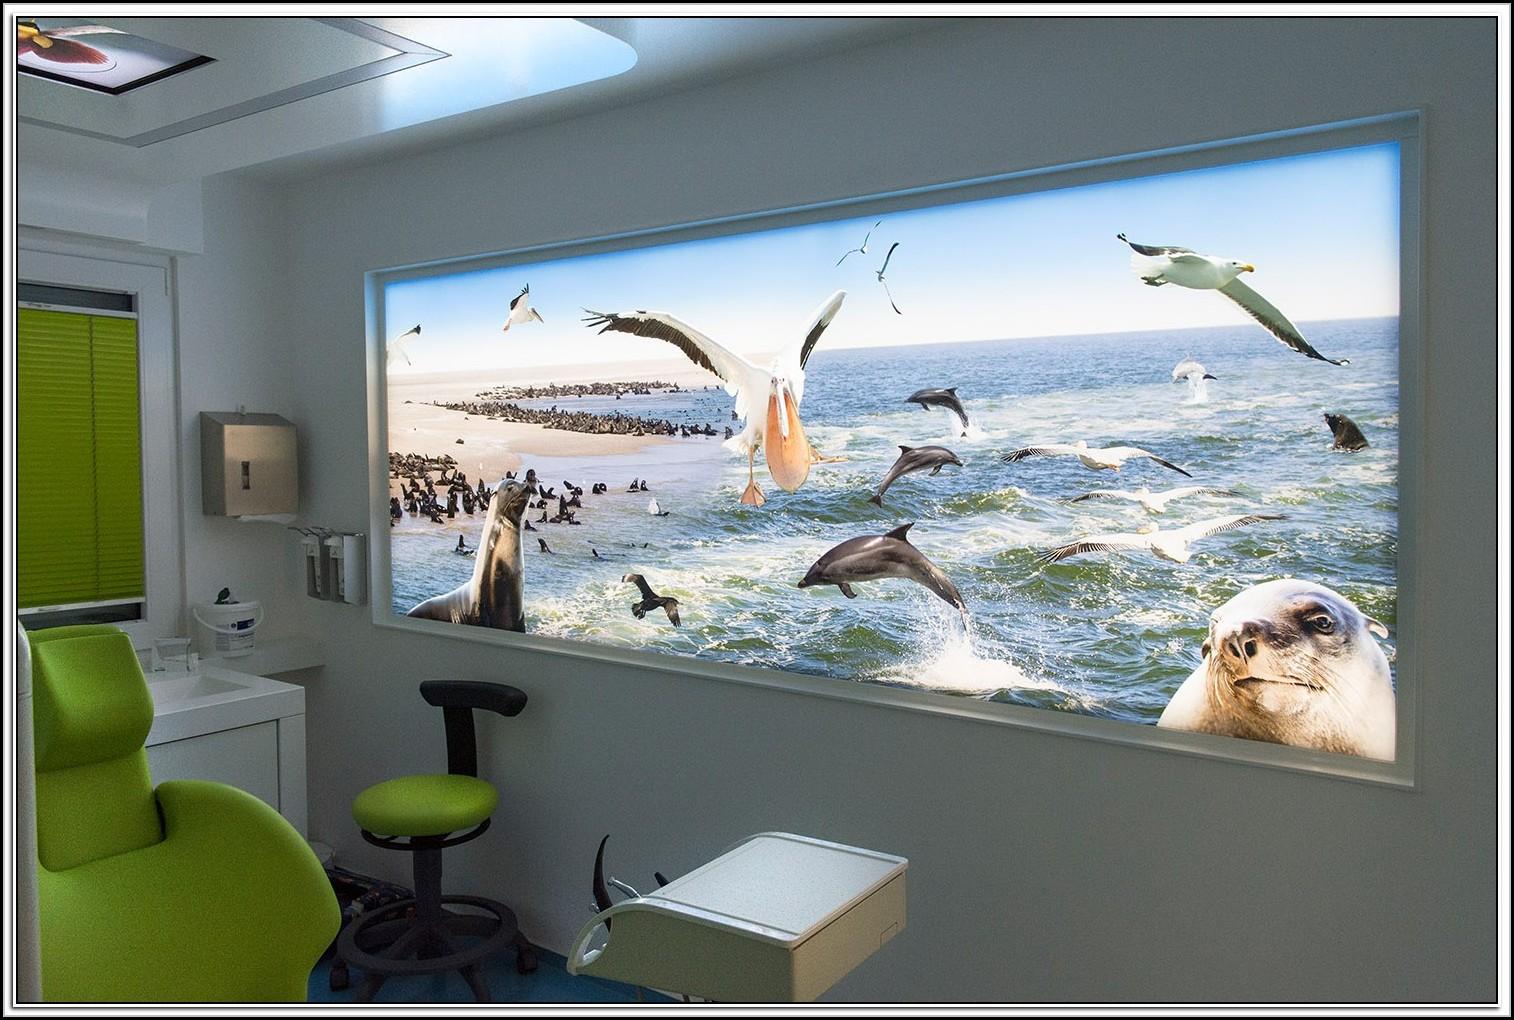 glasbilder mit beleuchtung beleuchthung house und dekor galerie pbw4av51x9. Black Bedroom Furniture Sets. Home Design Ideas